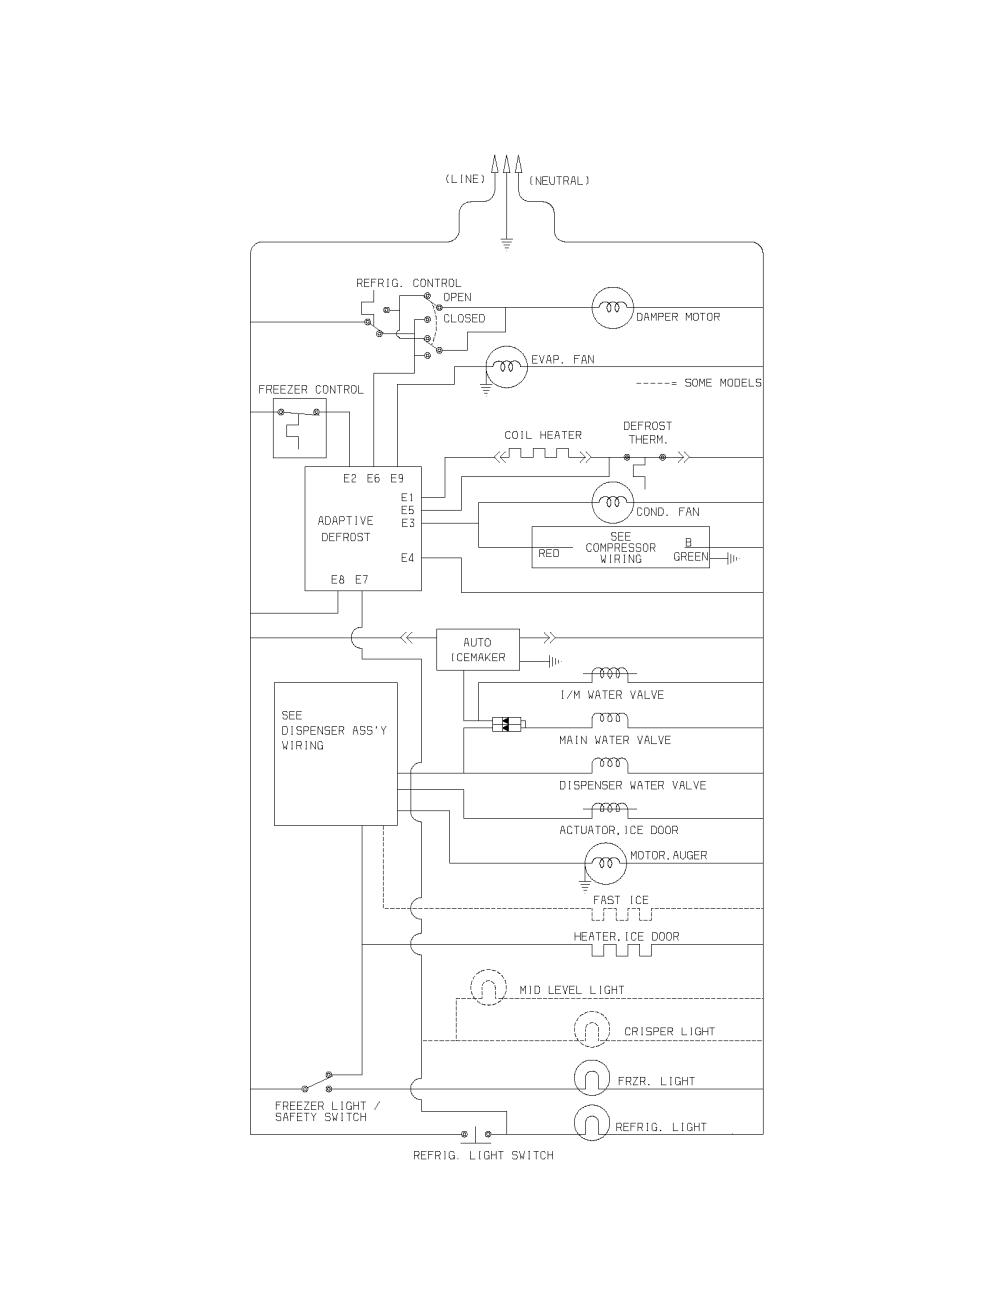 medium resolution of frigidaire frs23h5asb8 wiring schematic diagram